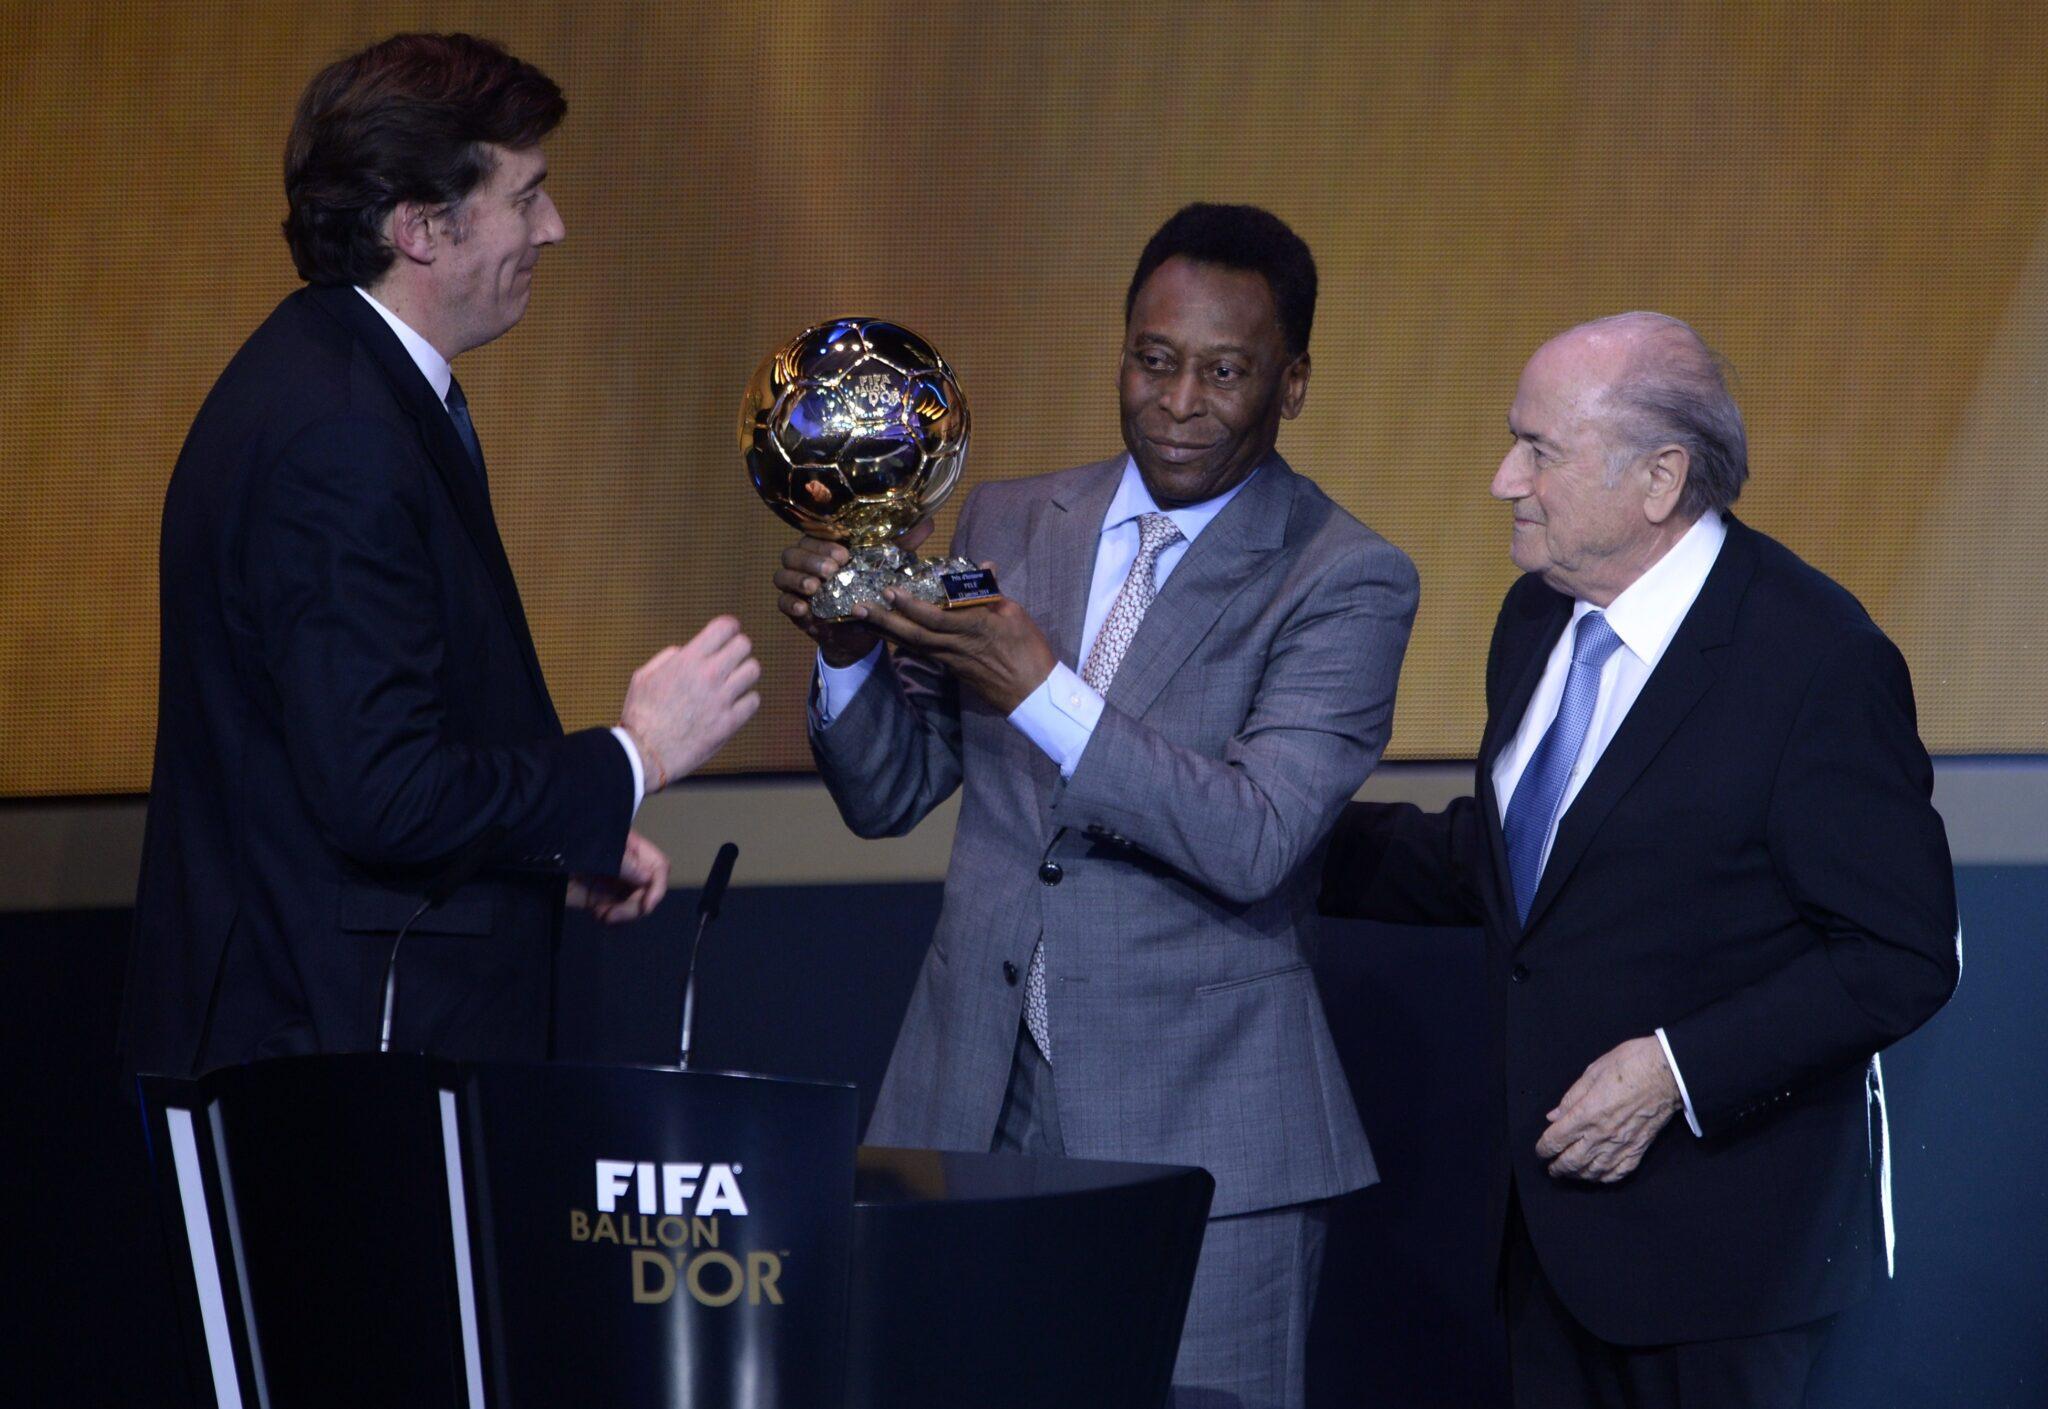 Moriniere, Pelé & Blatter - Foto Fabrice Coffrini AFP Getty Images OneFootball